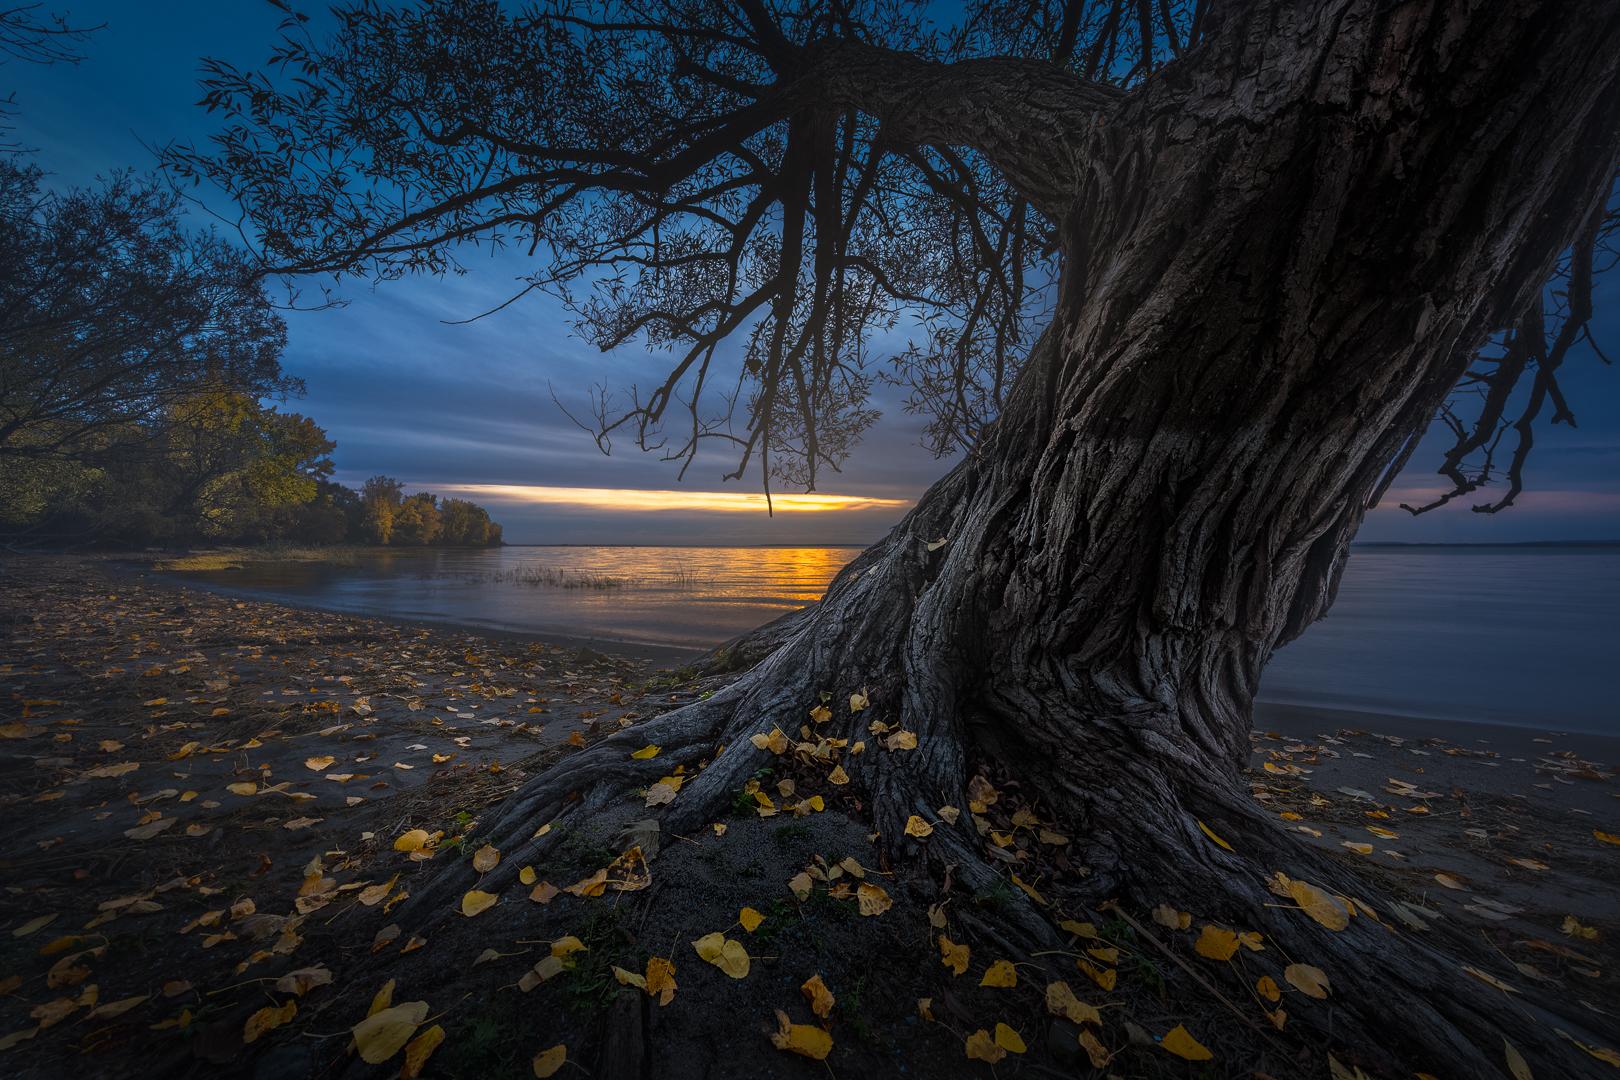 L'arbre est dans ses feuilles